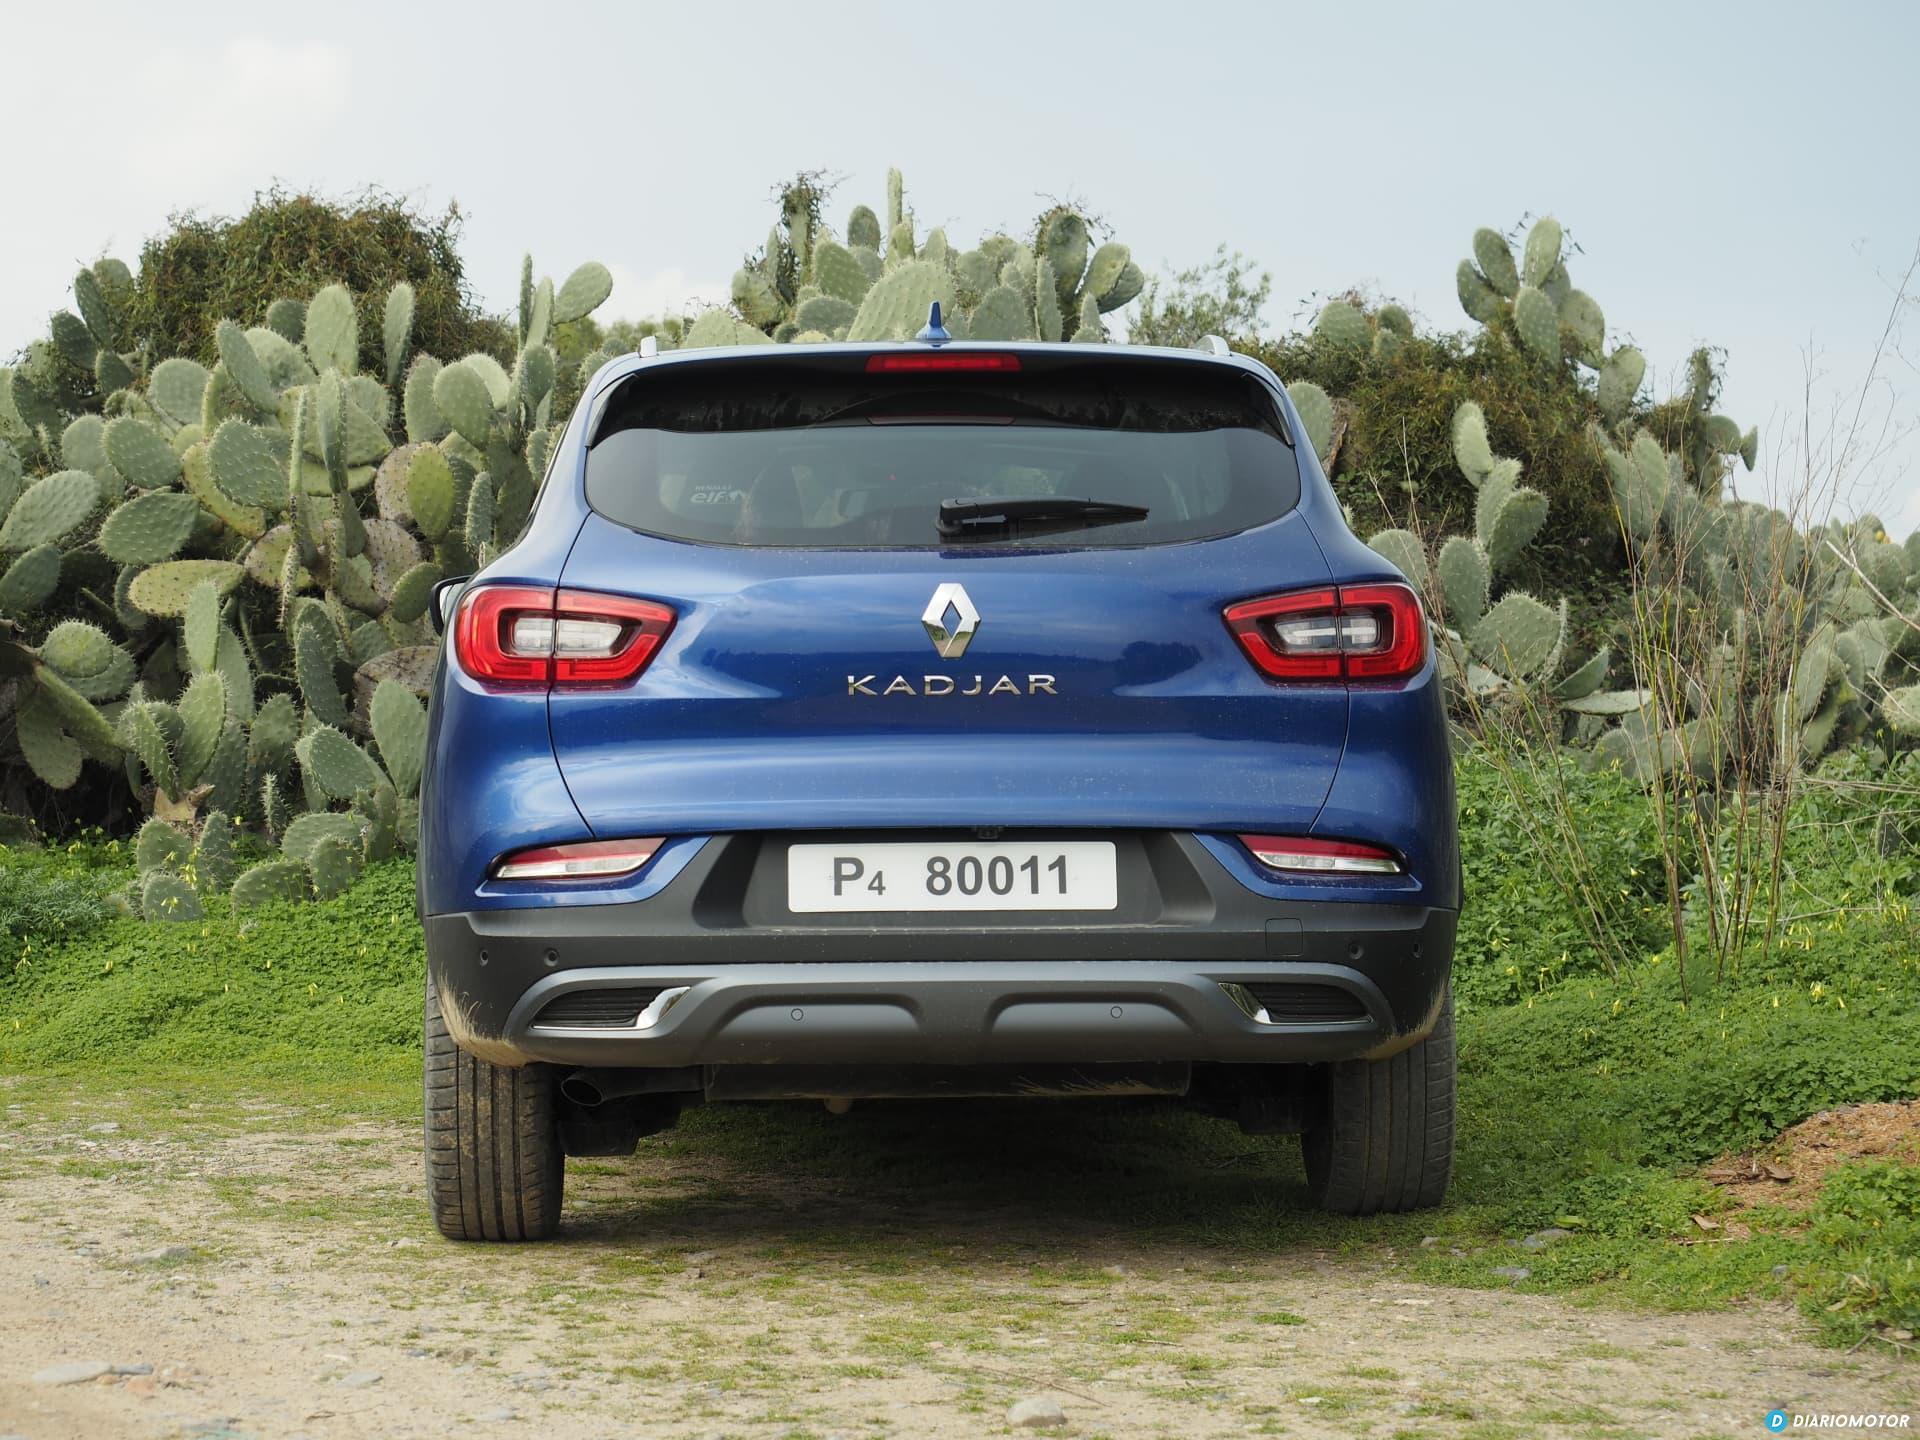 Renault Kadjar 2019 Exterior 00006